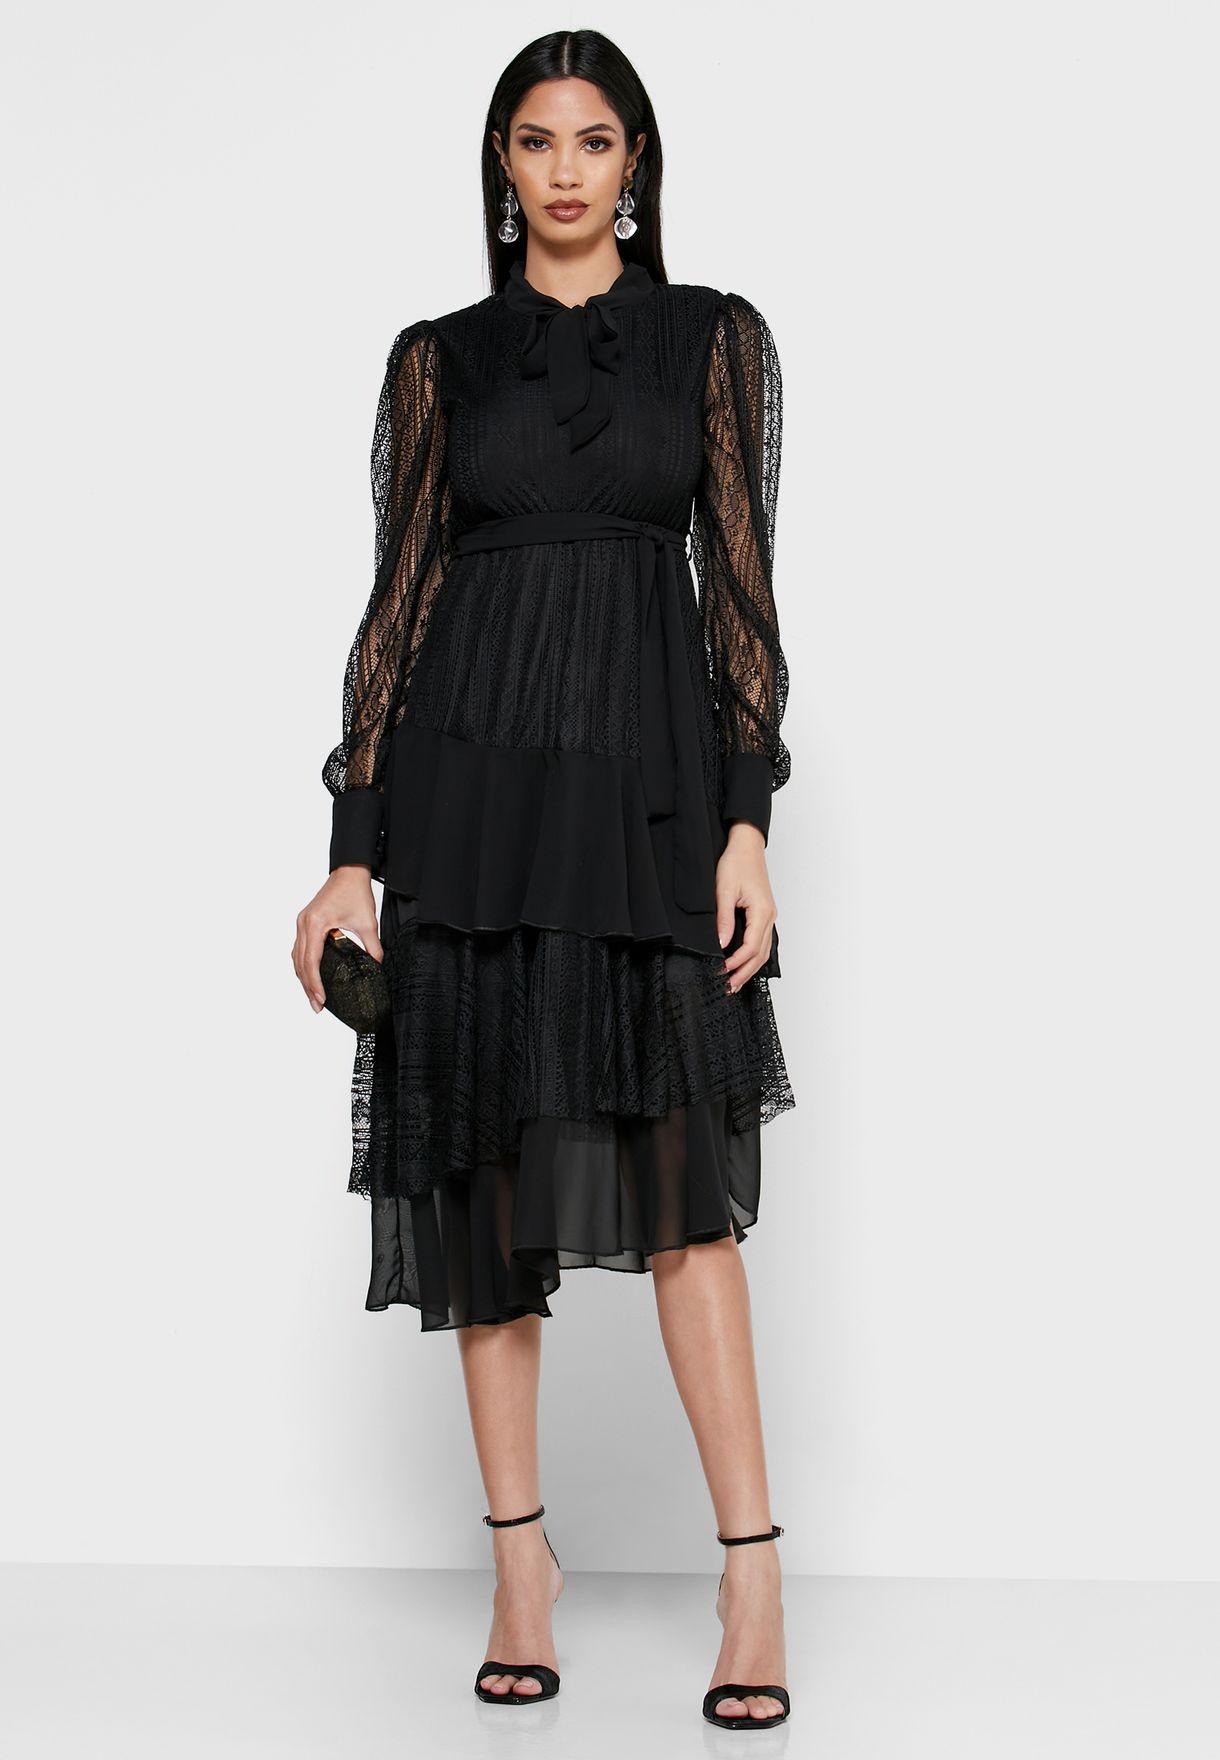 فستان بتداخل دانتيل وطبقات كشكش